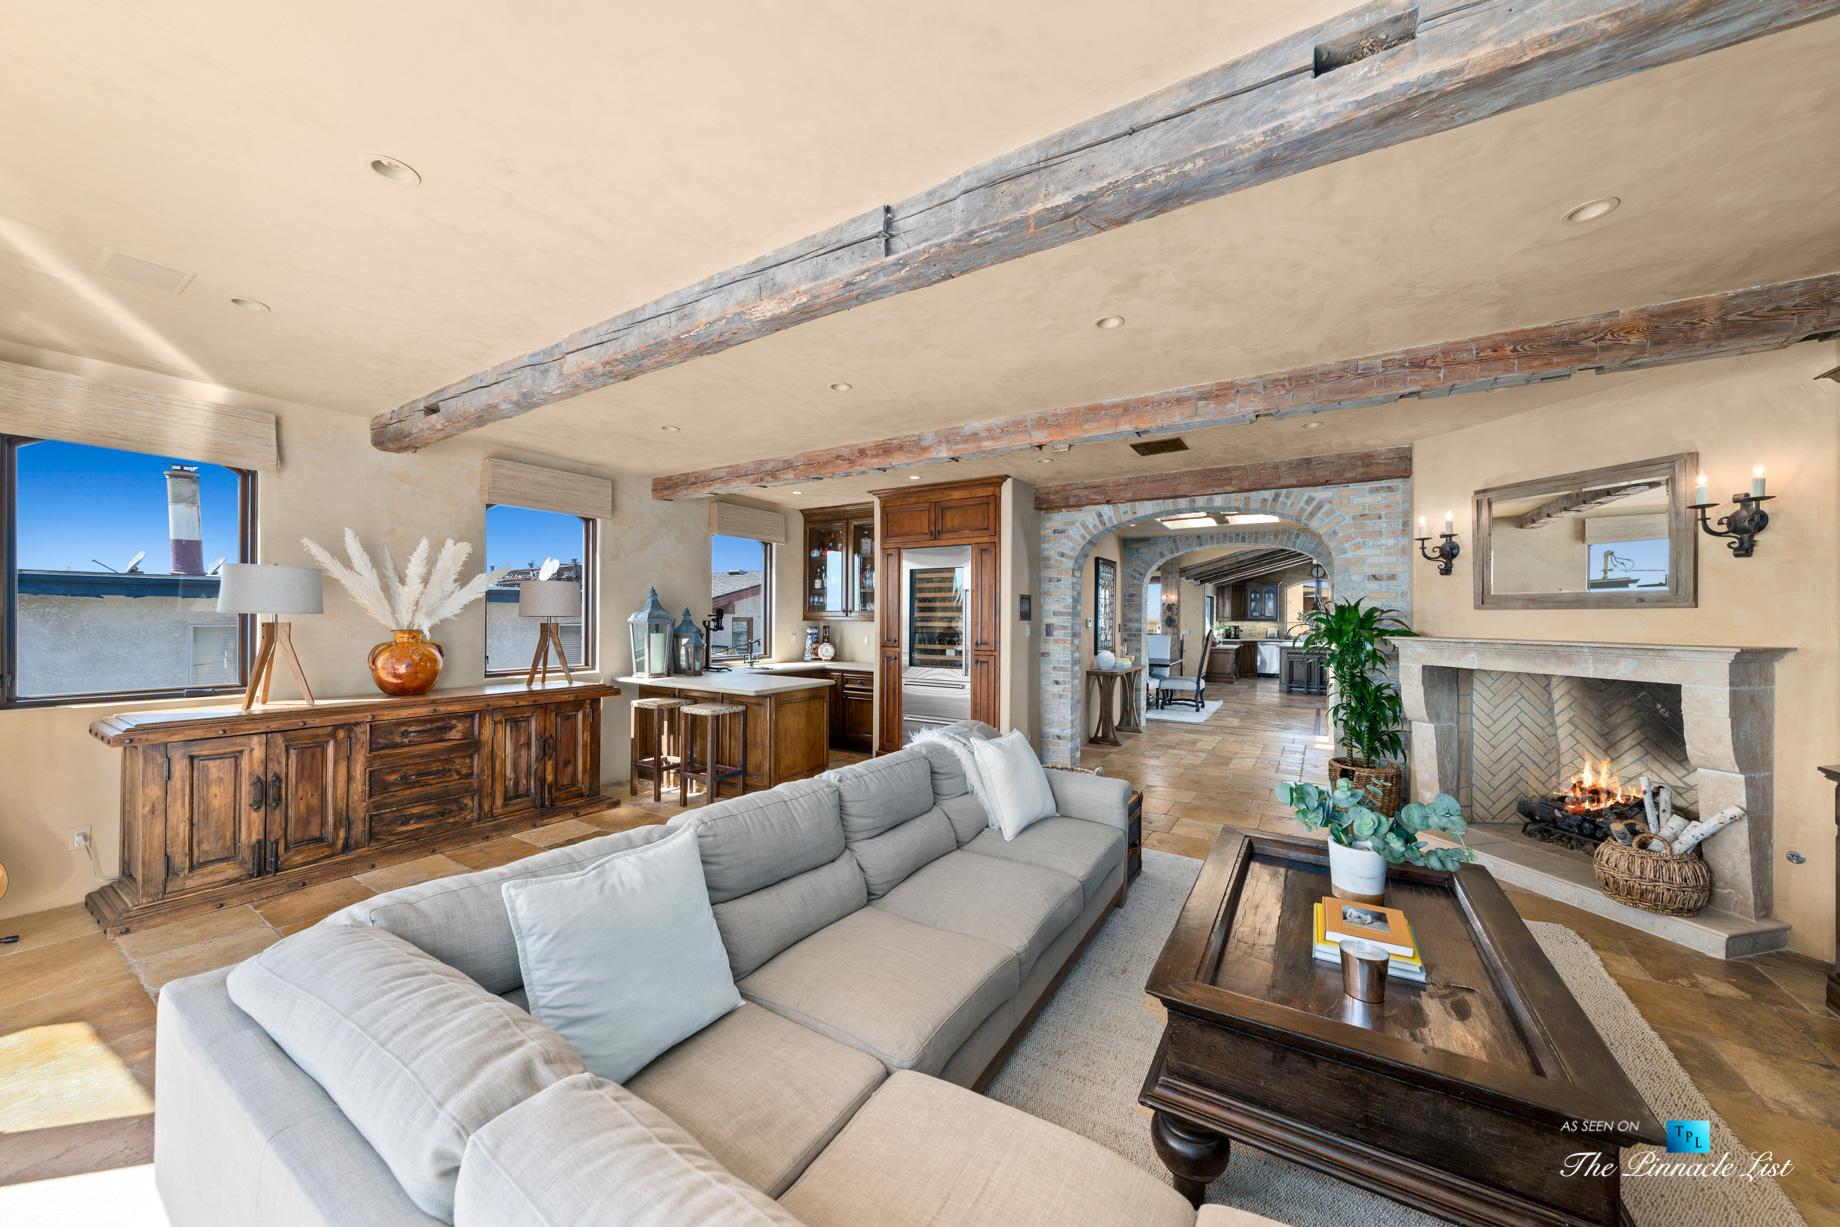 216 7th St, Manhattan Beach, CA, USA – Luxury Real Estate – Coastal Villa Home – Living Room with Summer Kitchen